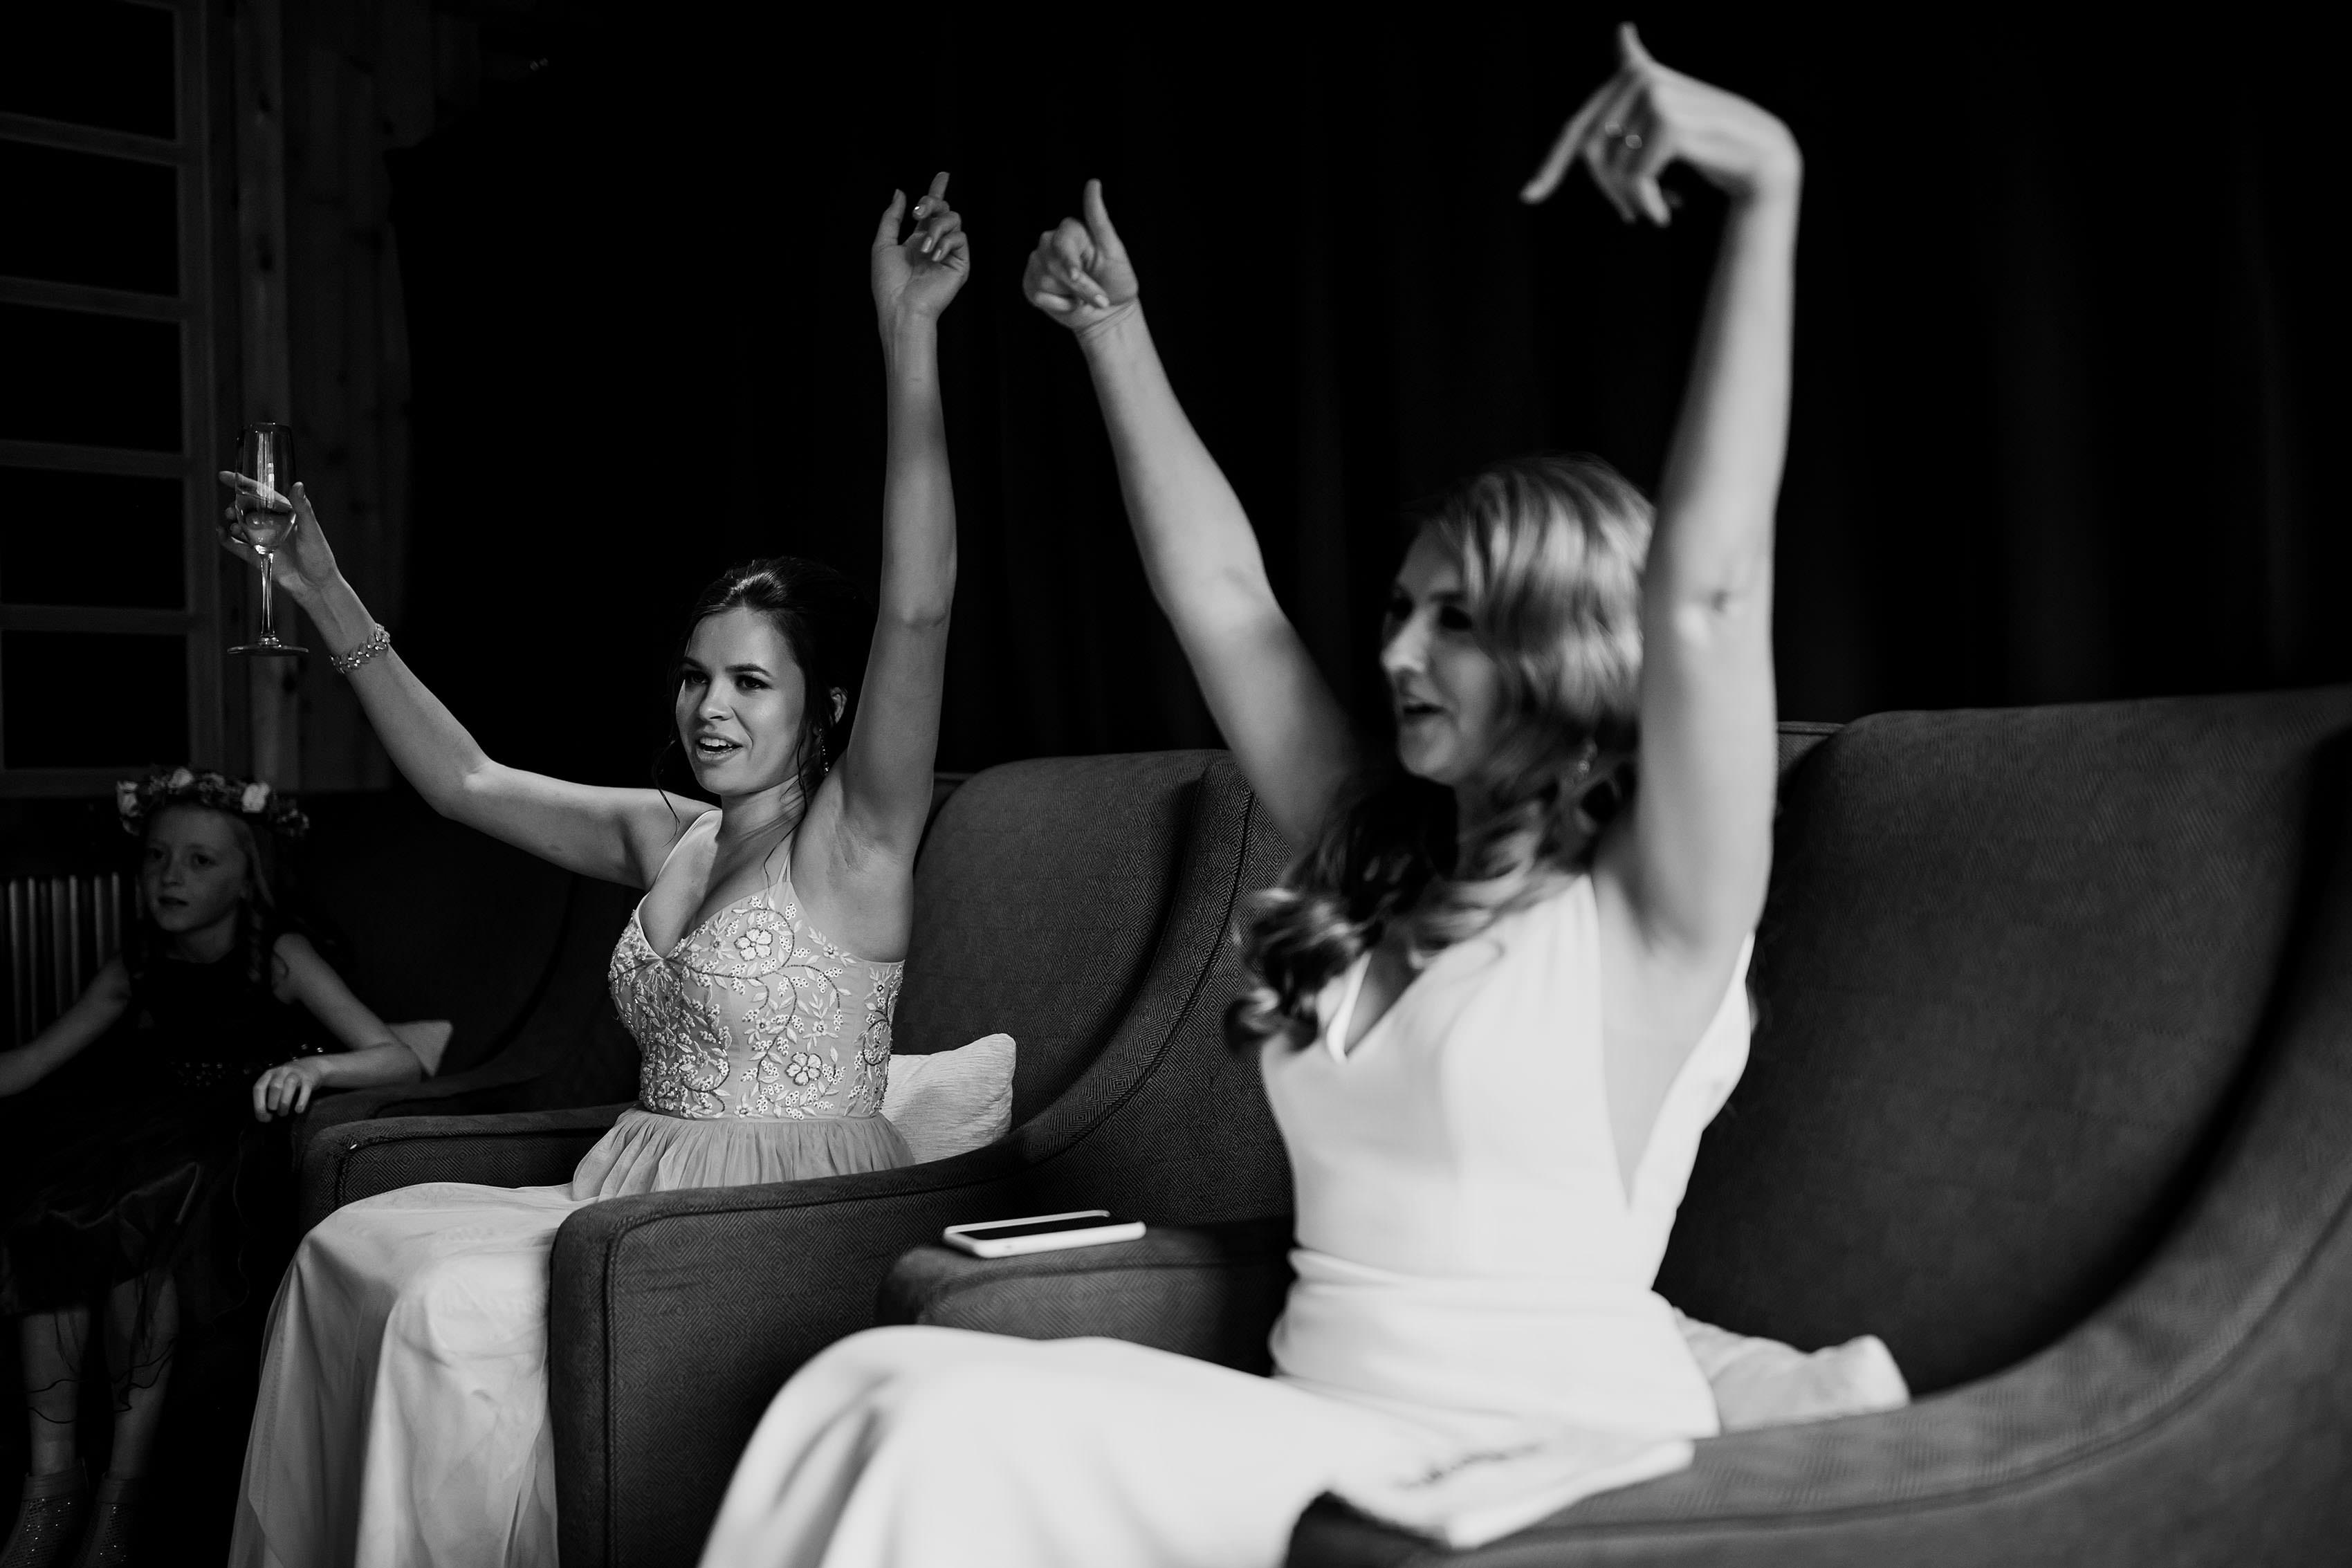 Heather dances before the wedding